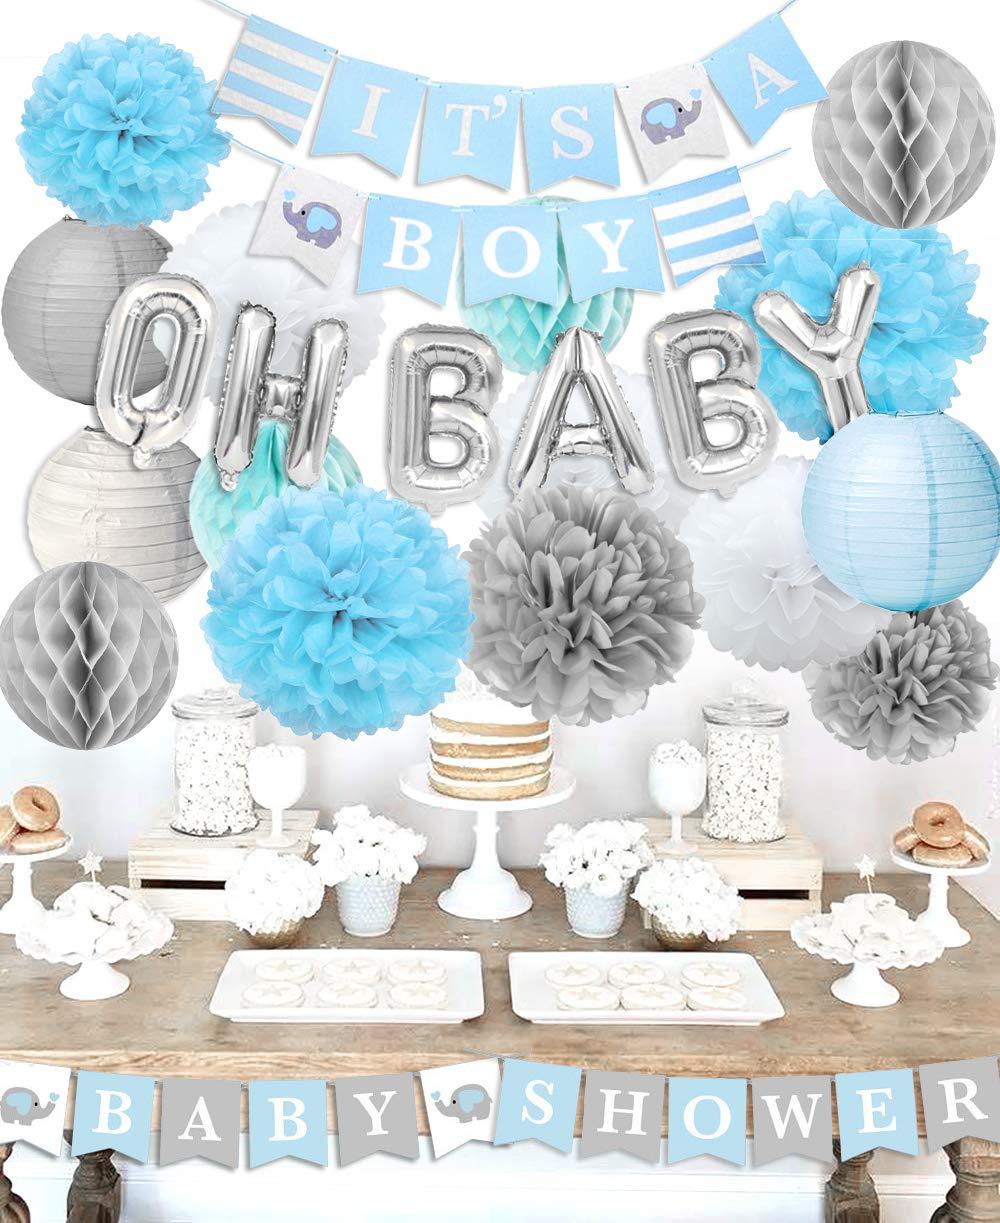 Amazon.com: Boy Baby Shower Decorations - It's A Boy Baby Shower  Decorations Kit with Oh Baby Balloons It's A Boy Baby Shower Banner: Home &  Kitchen